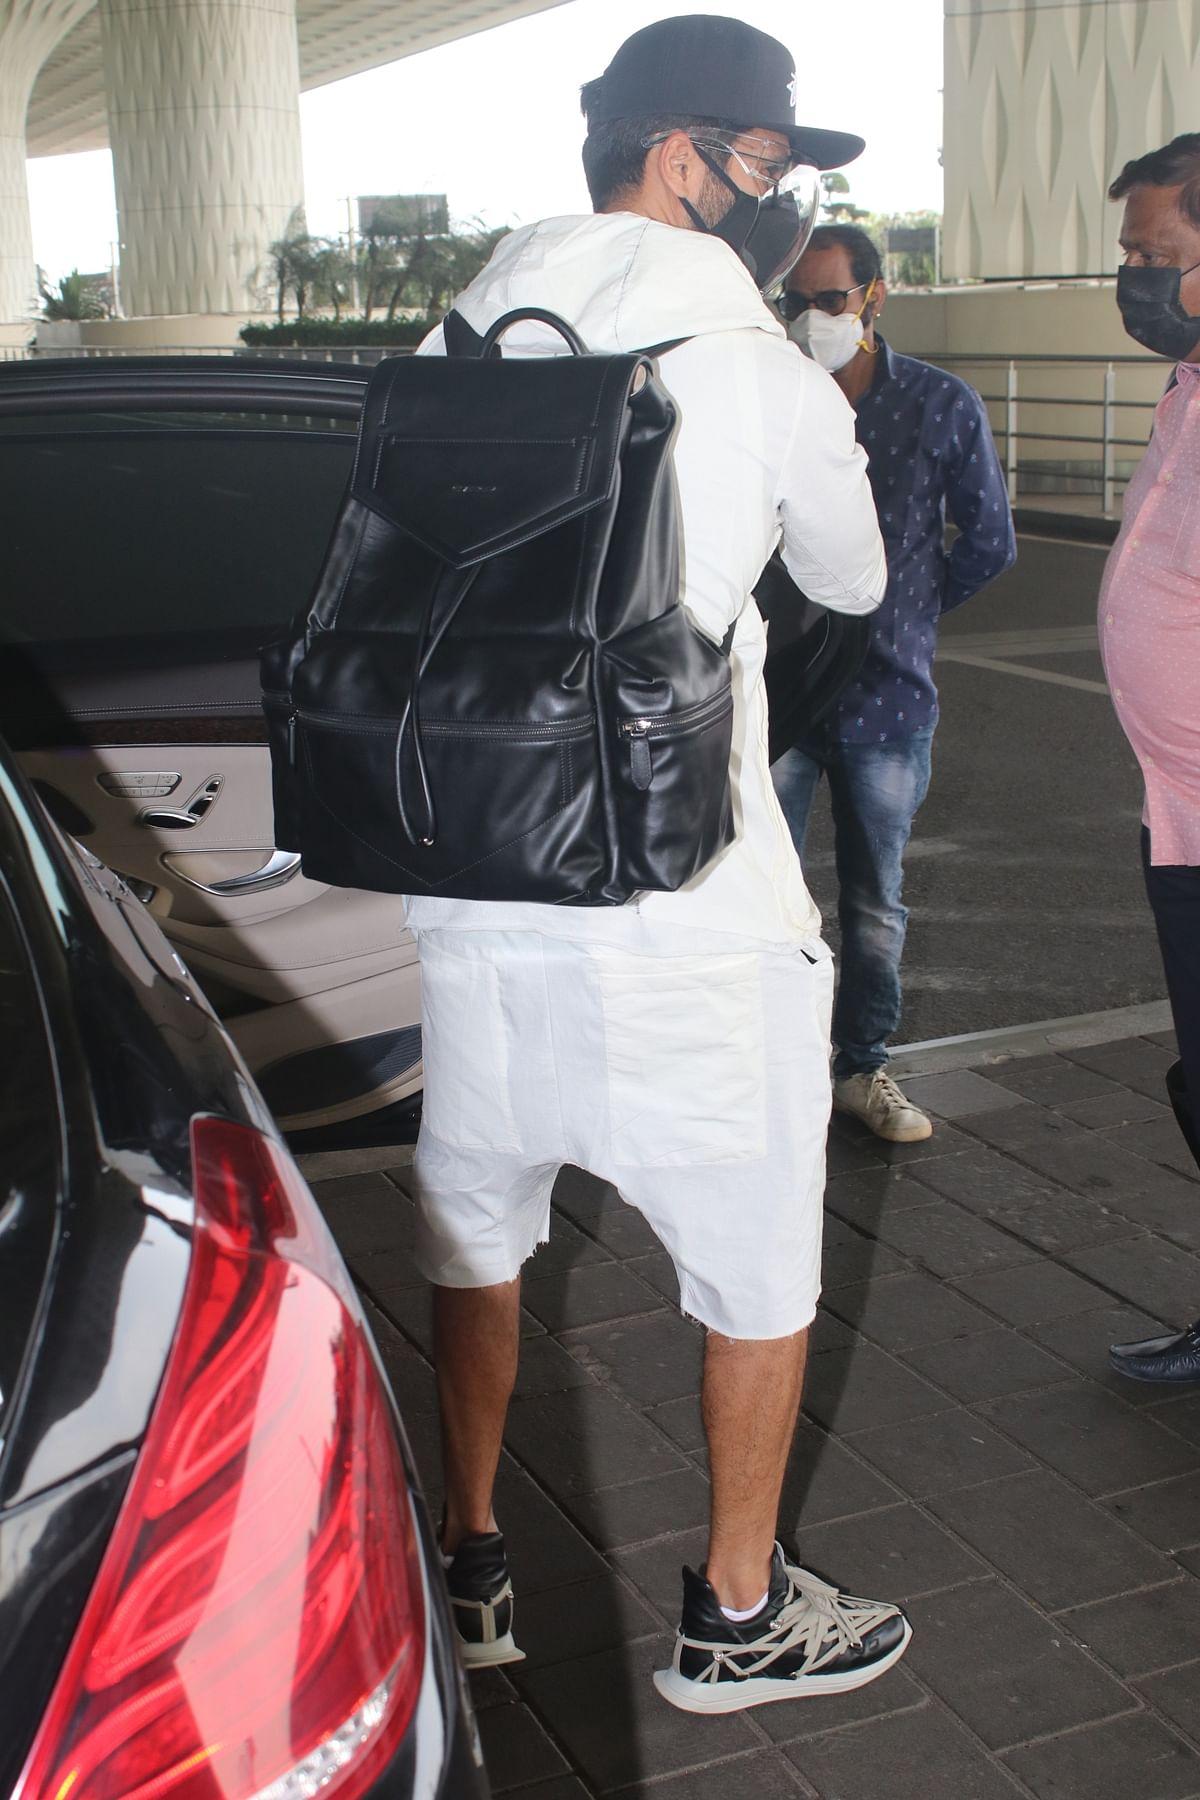 Shahid Kapoor flaunts Rs 2.2 lakh backpack in a dapper ensemble at Mumbai airport